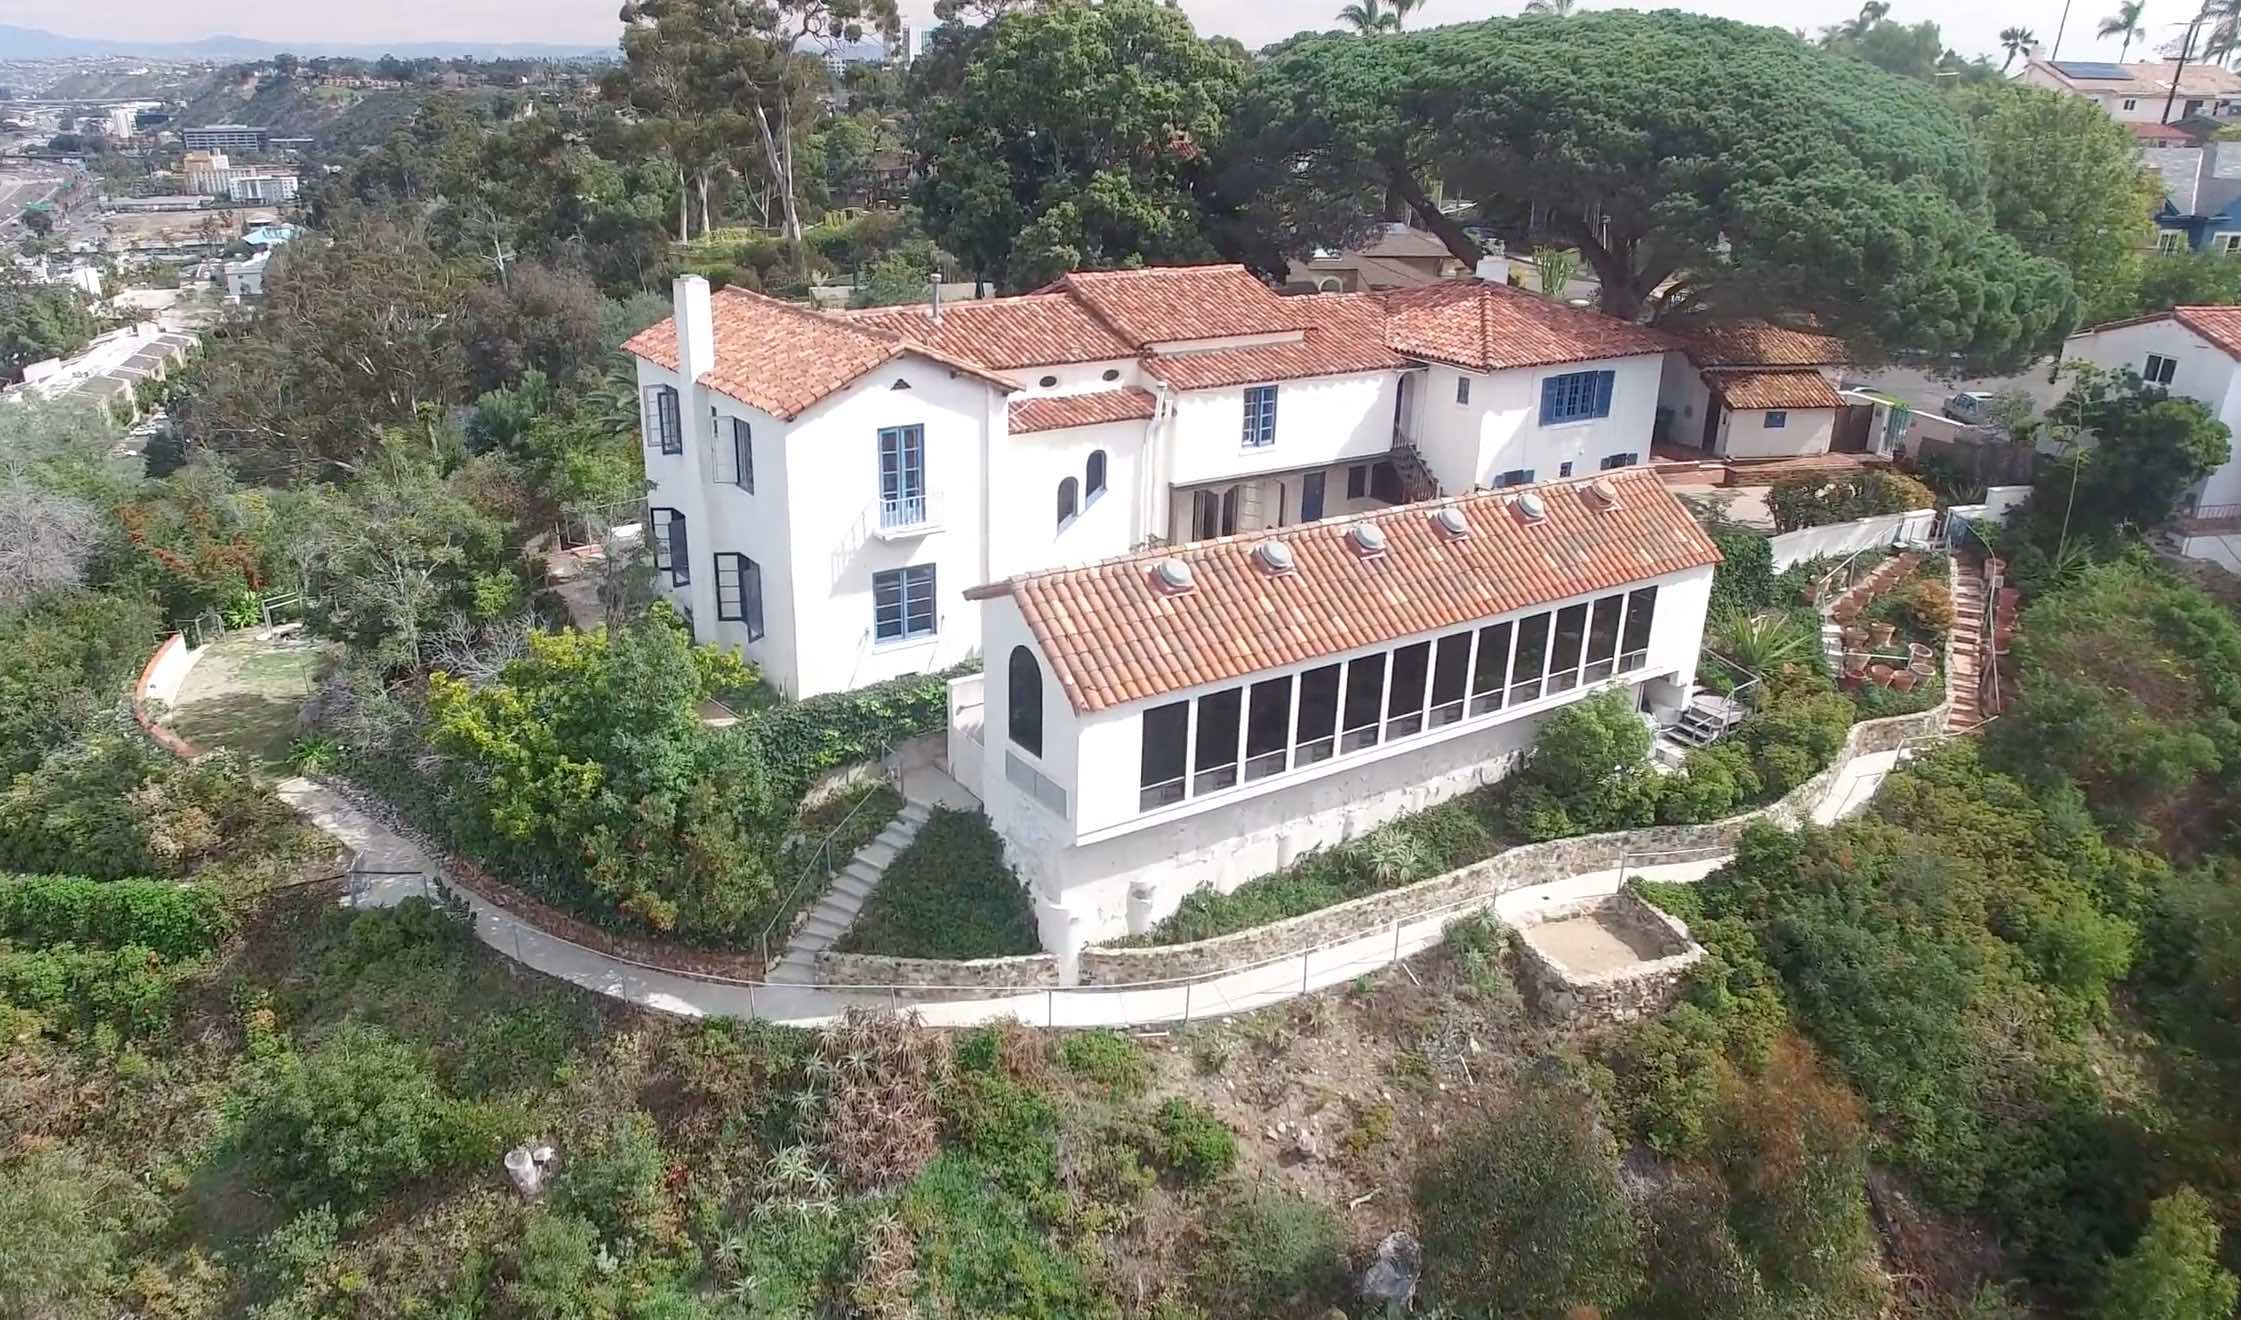 Villa-Hermosa-Aerial-6